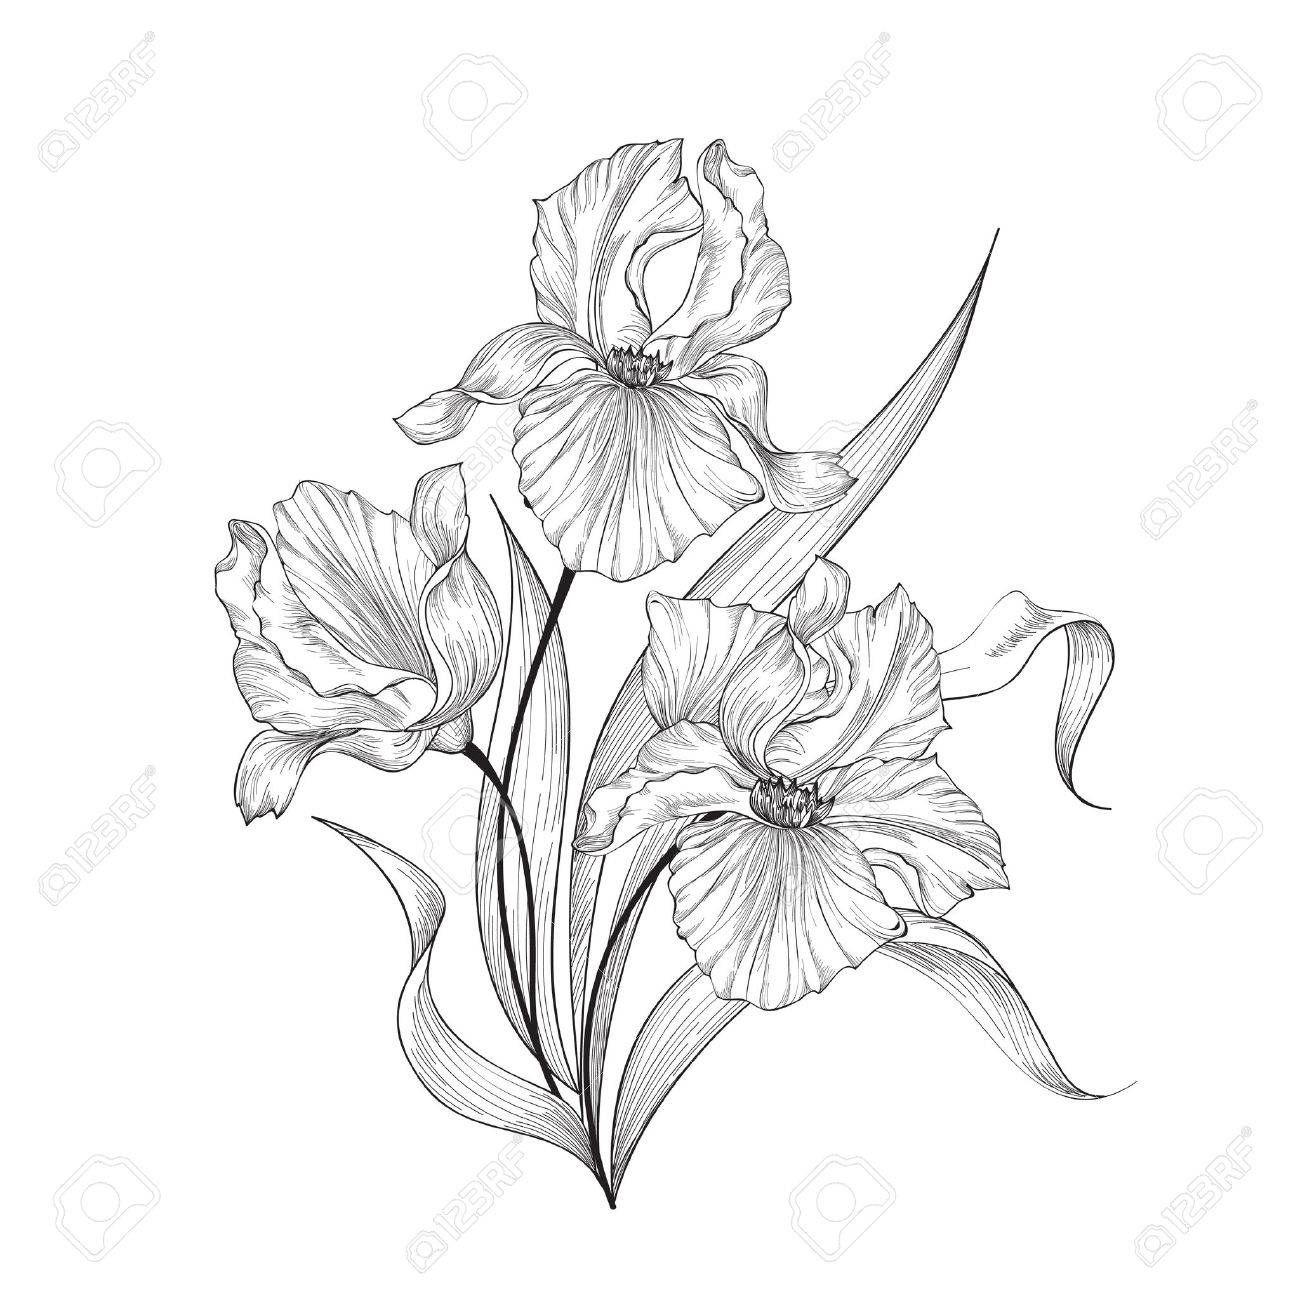 Floral Bouquet With Flower Iris Vintage Fourish Greeting Card Design Swirl Flower Posy Engraving Border Flora Iris Flower Tattoo Flower Drawing Iris Flowers